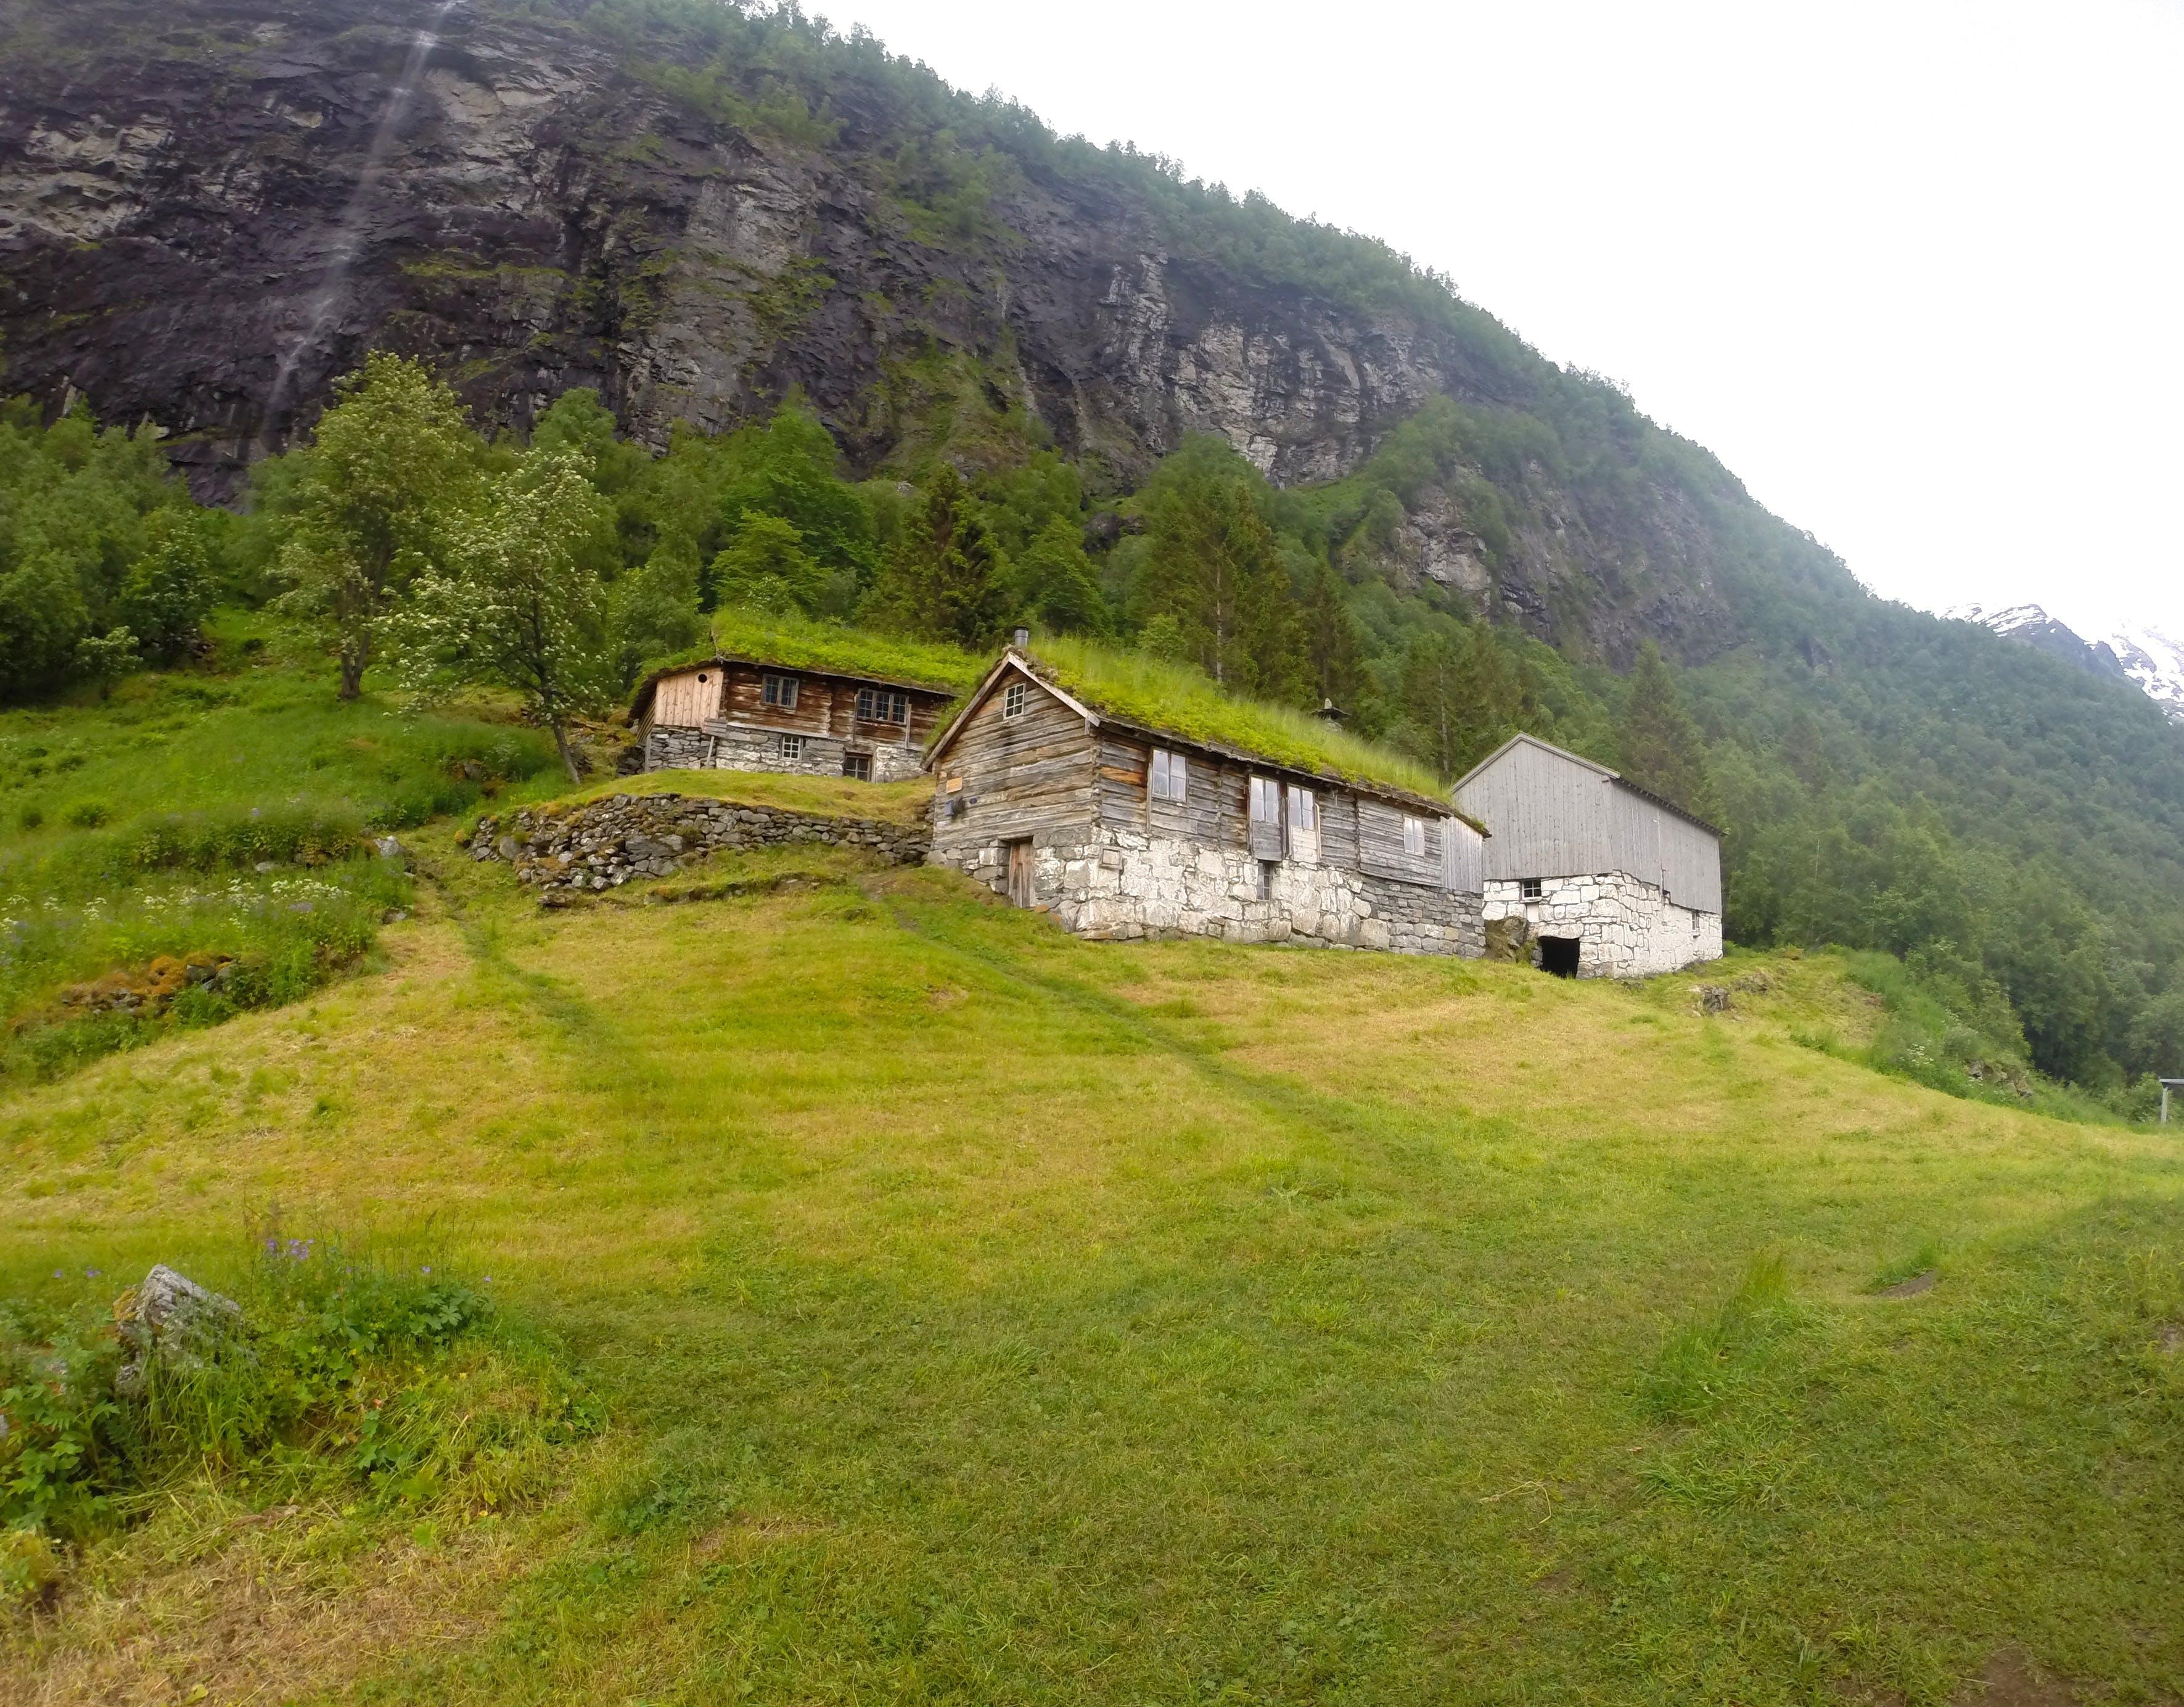 Fjord hiking, steep and beautiful!